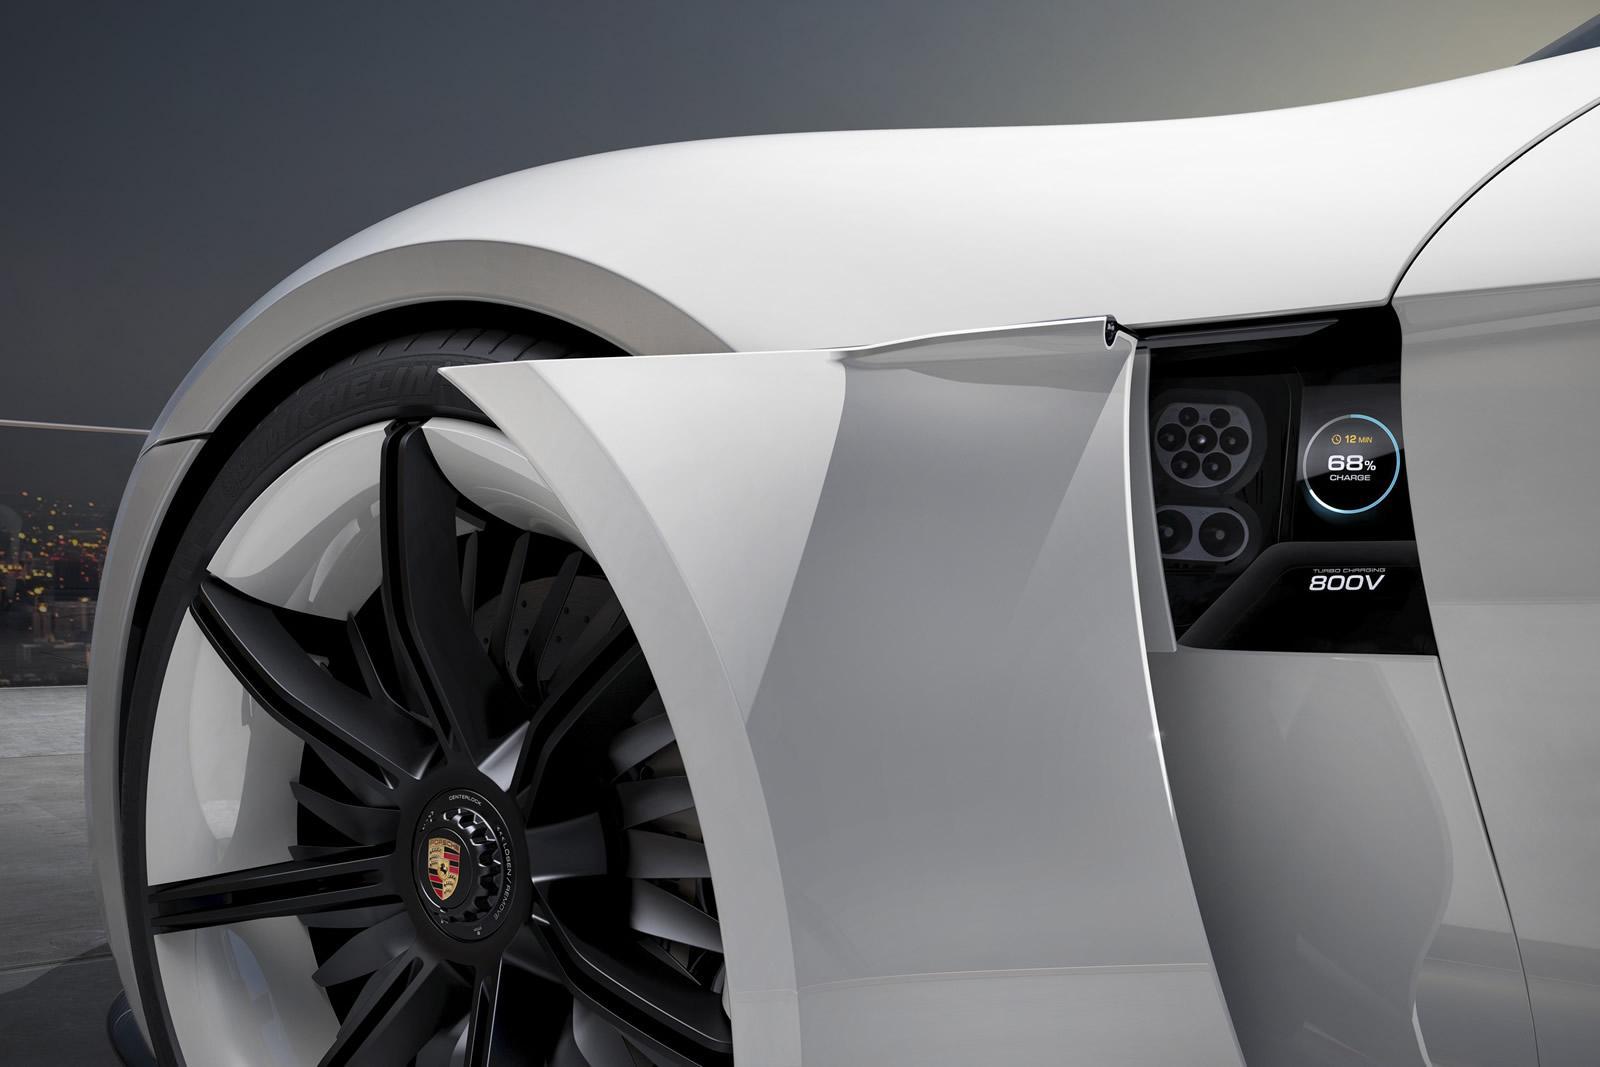 2015 Porsche Mission E detalhe